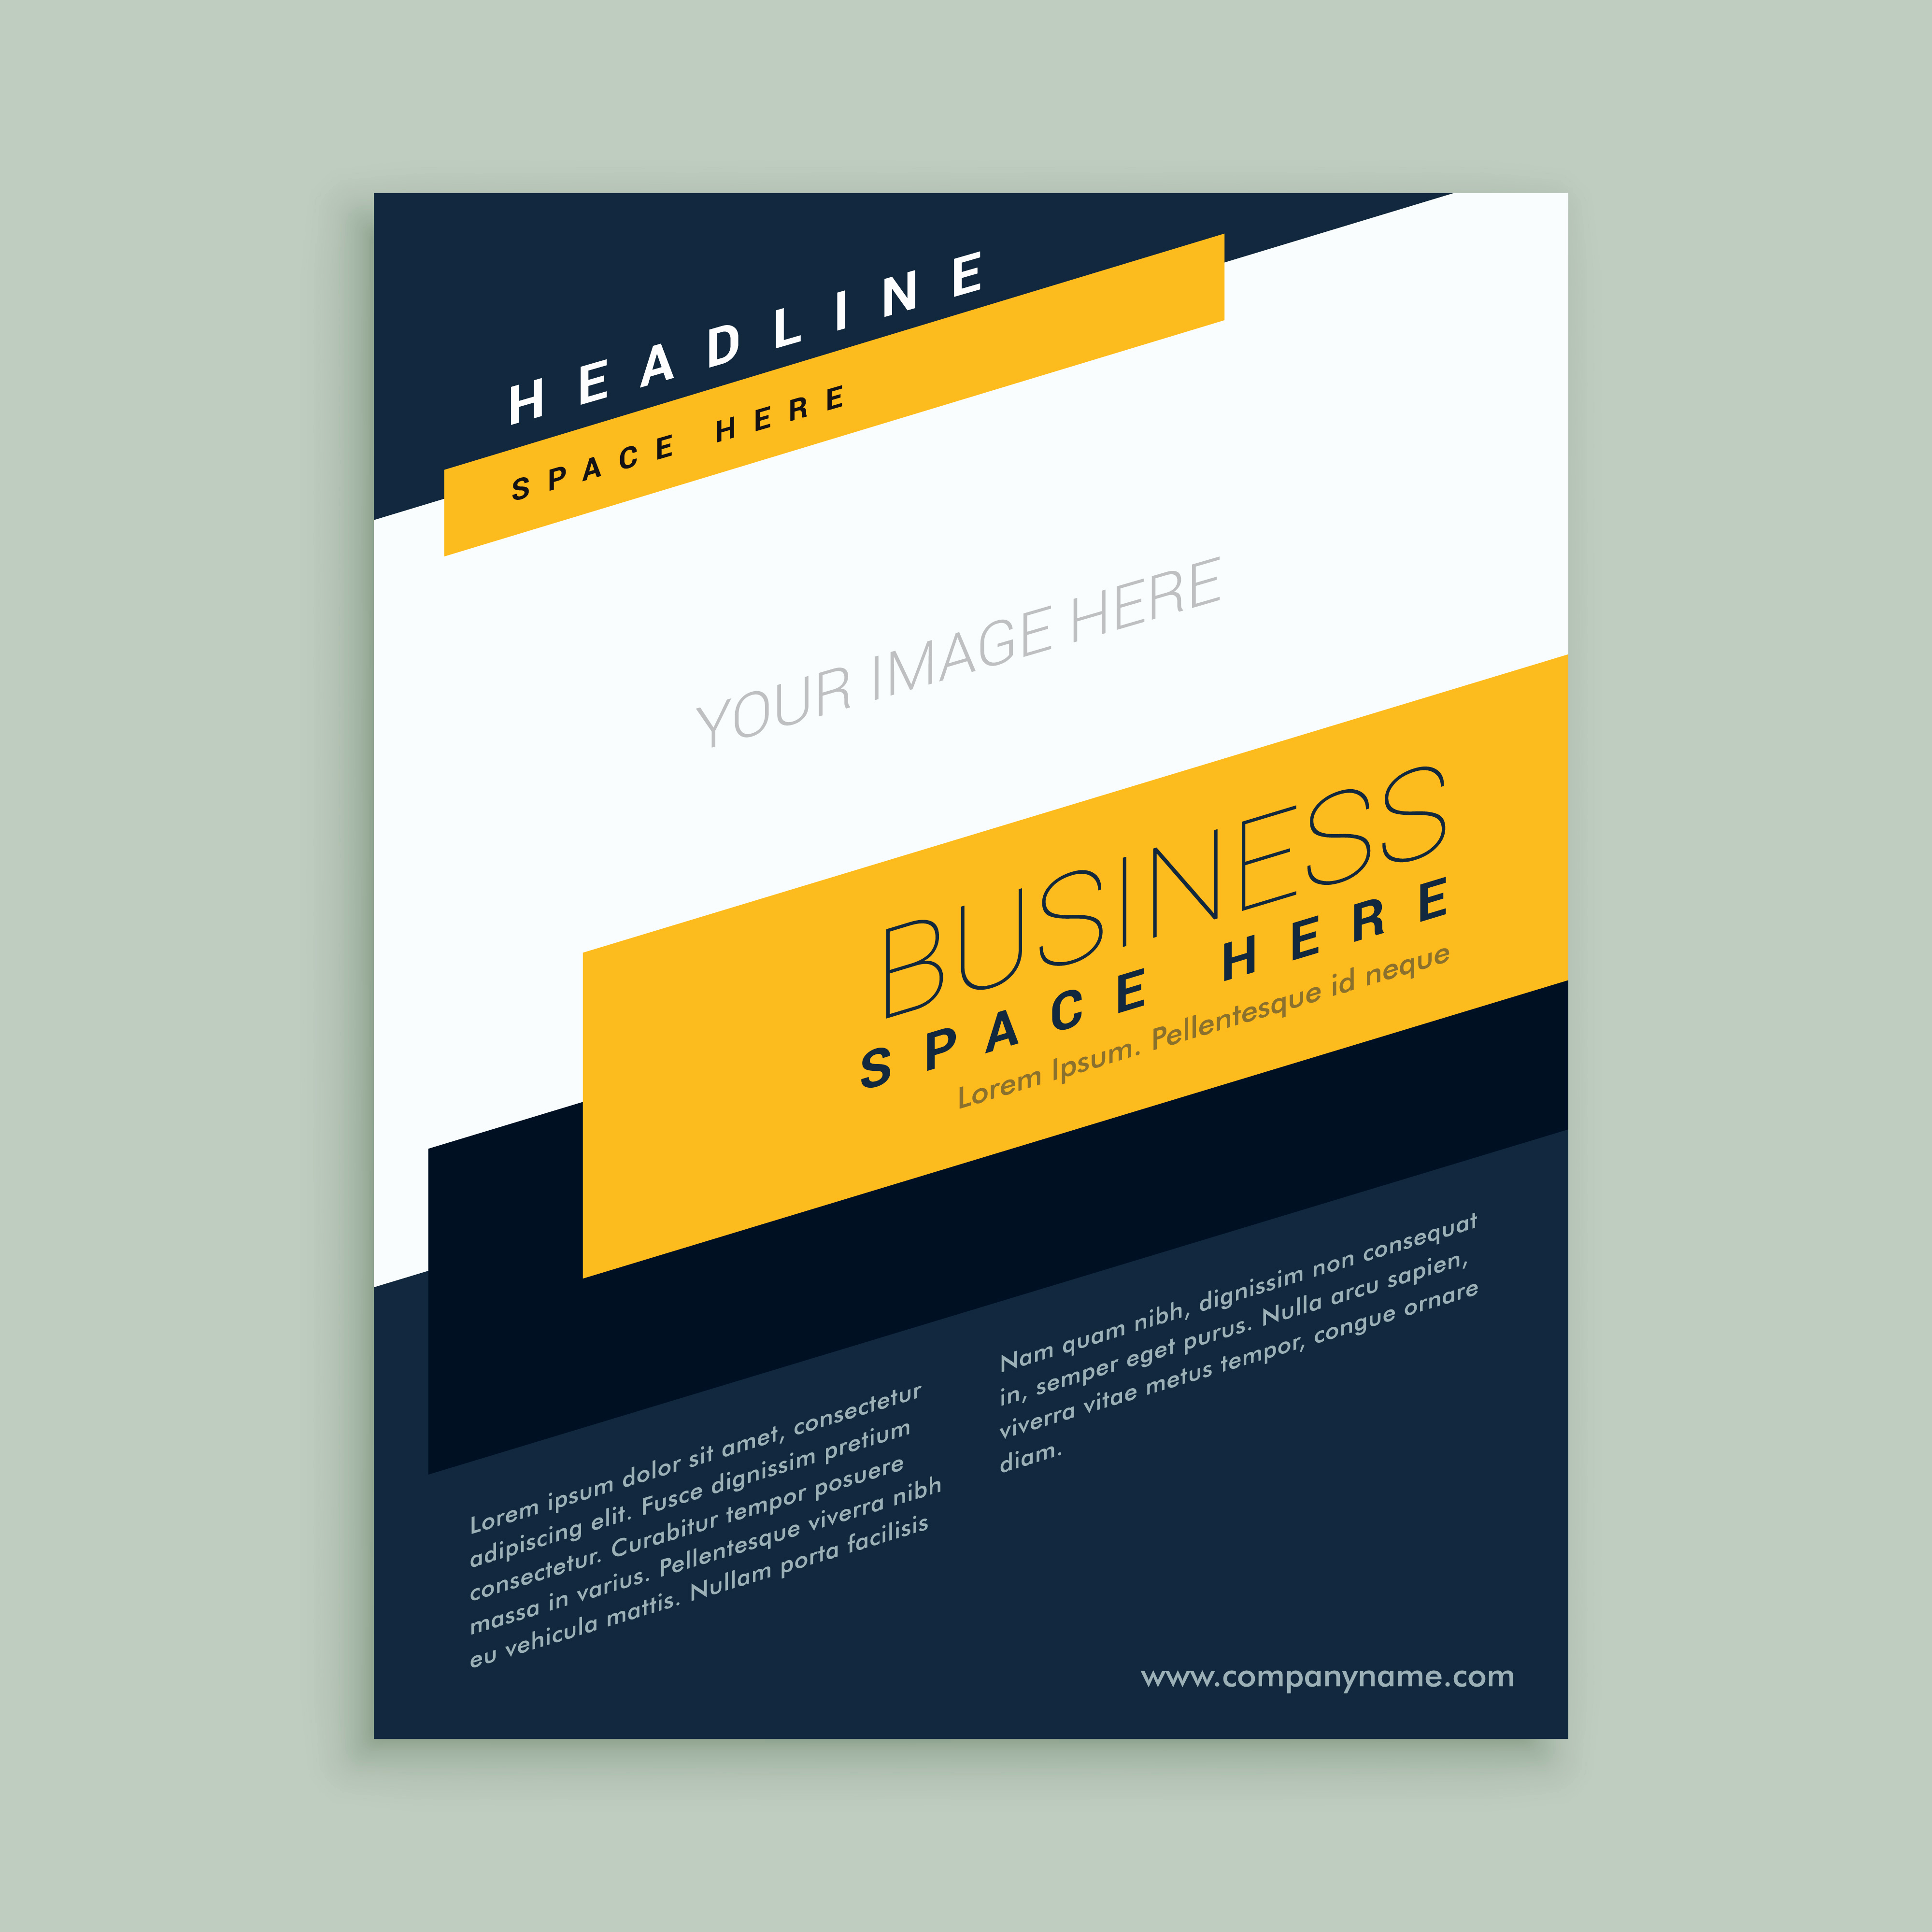 Business Flyer Templates Free Inspirational Flyer Design Free Vector Art 71 042 Free Downloads